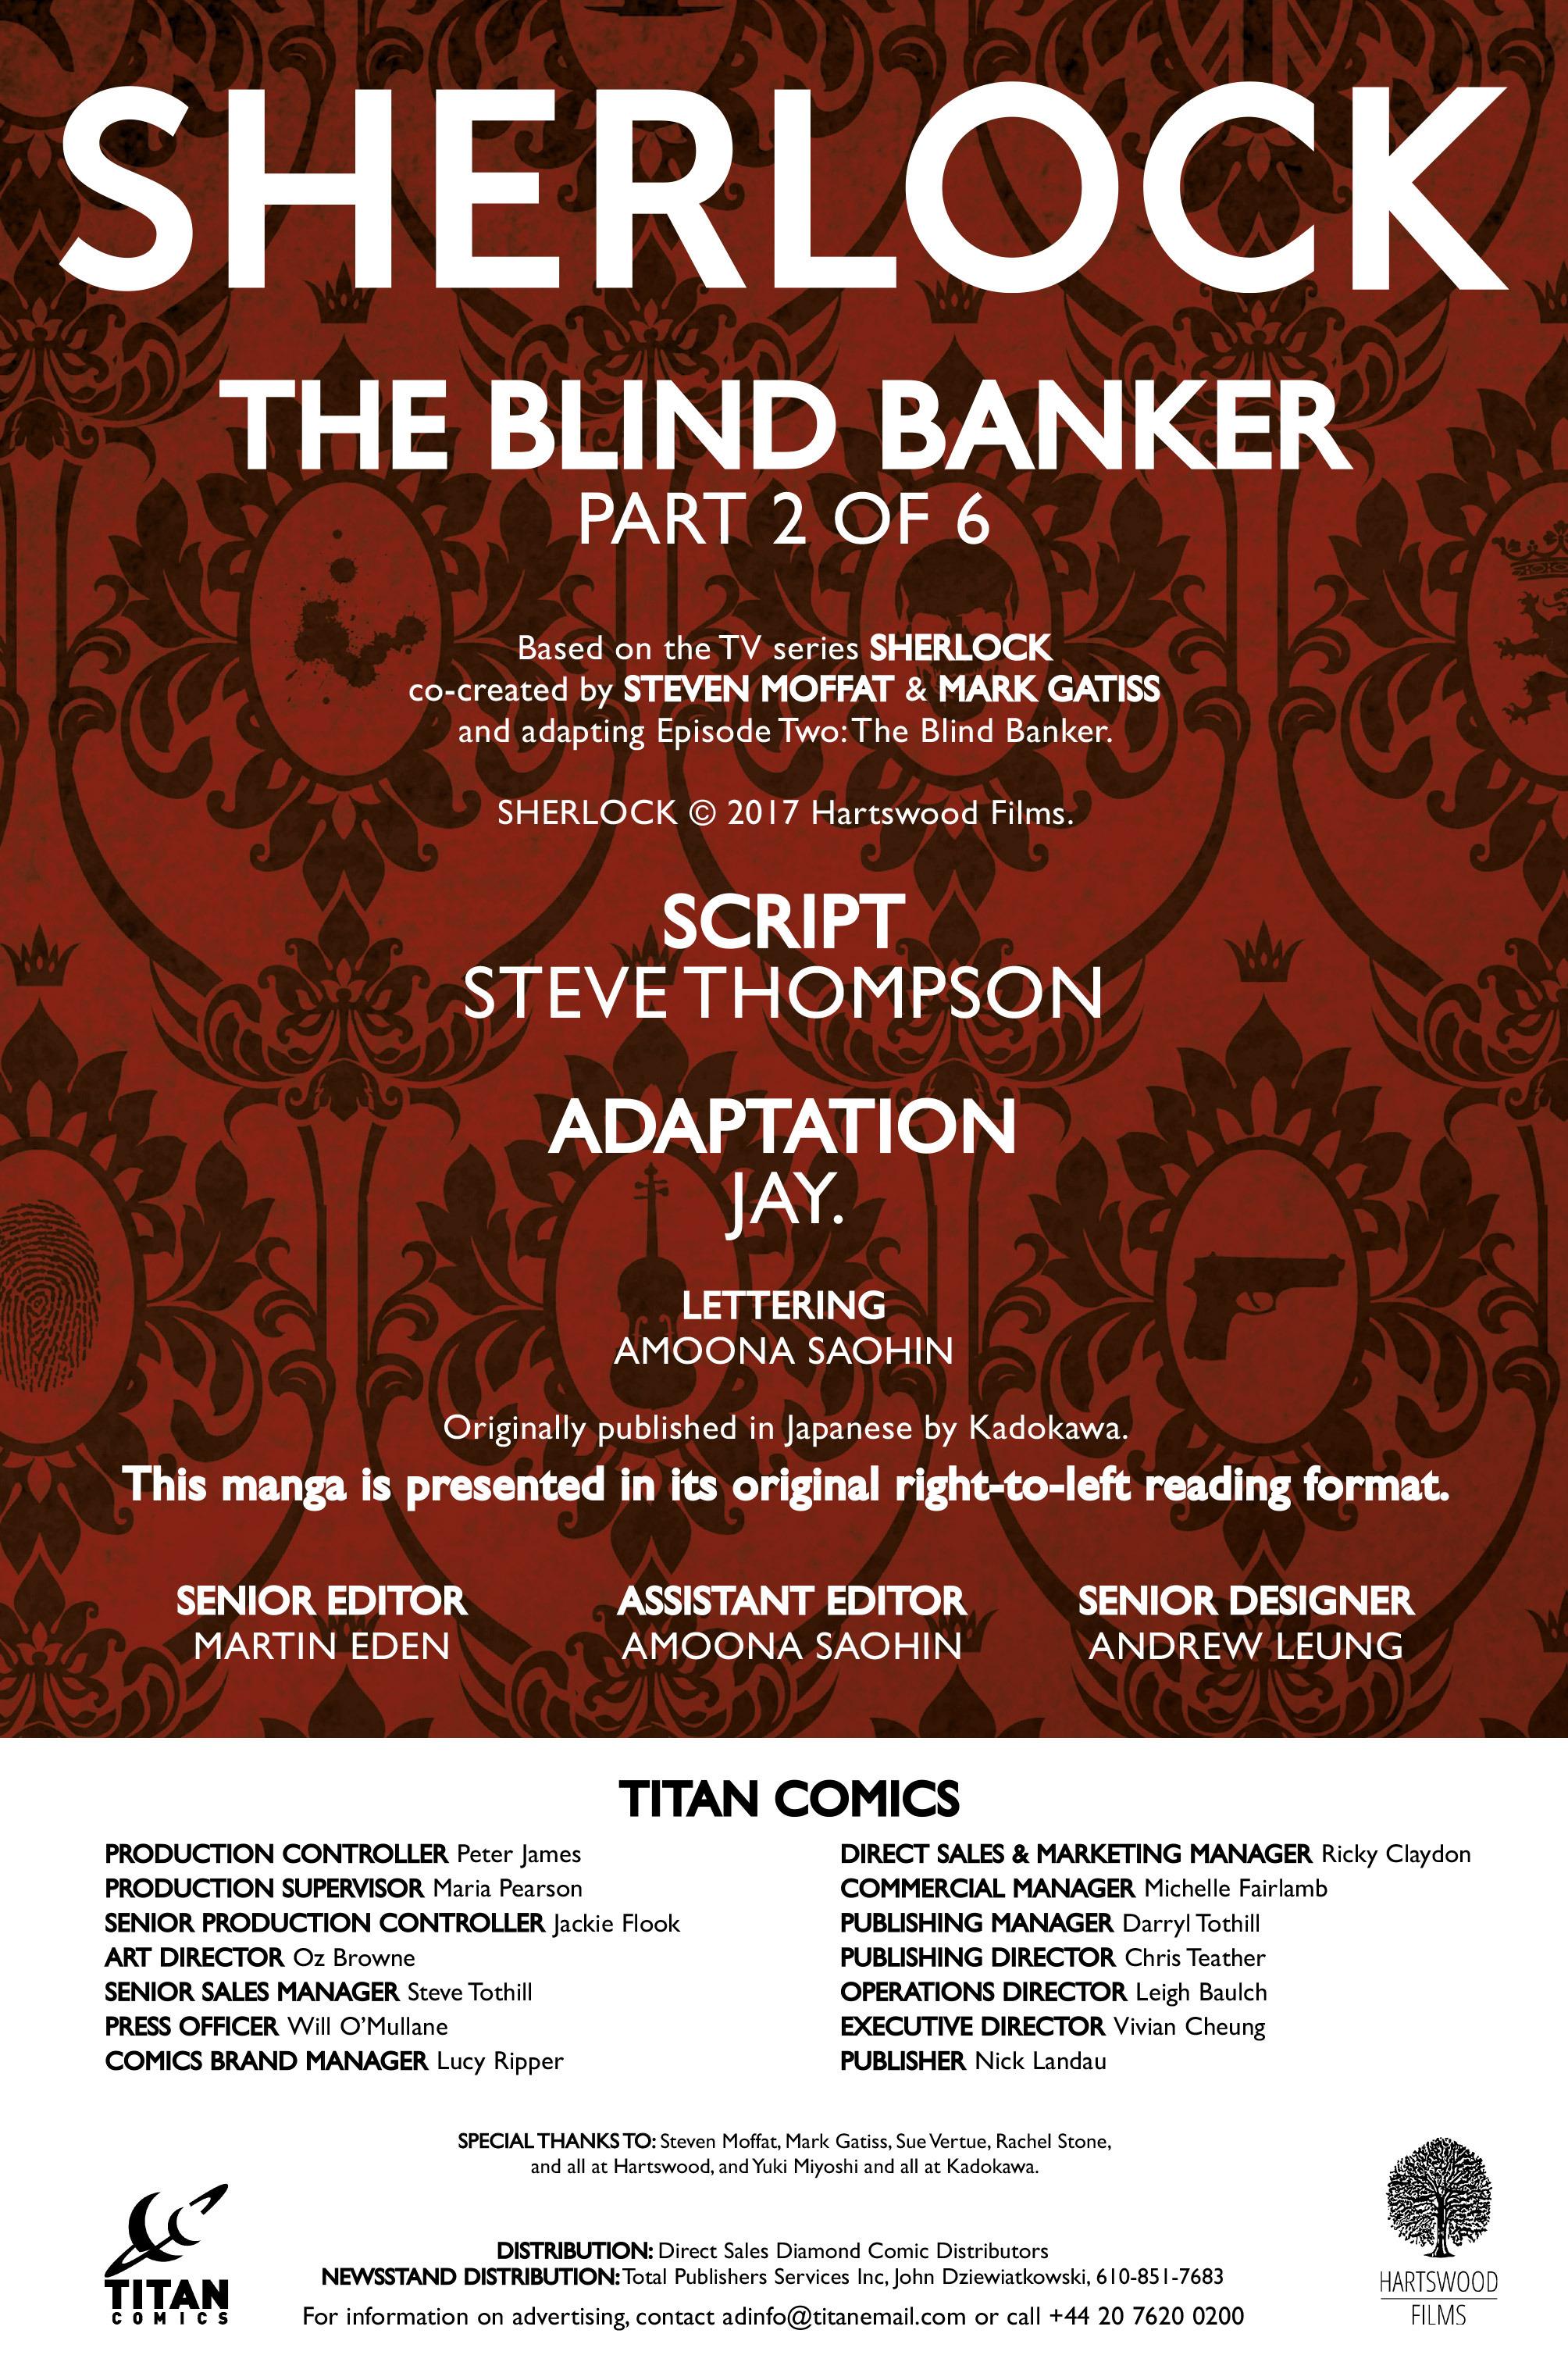 Read online Sherlock: The Blind Banker comic -  Issue #2 - 5